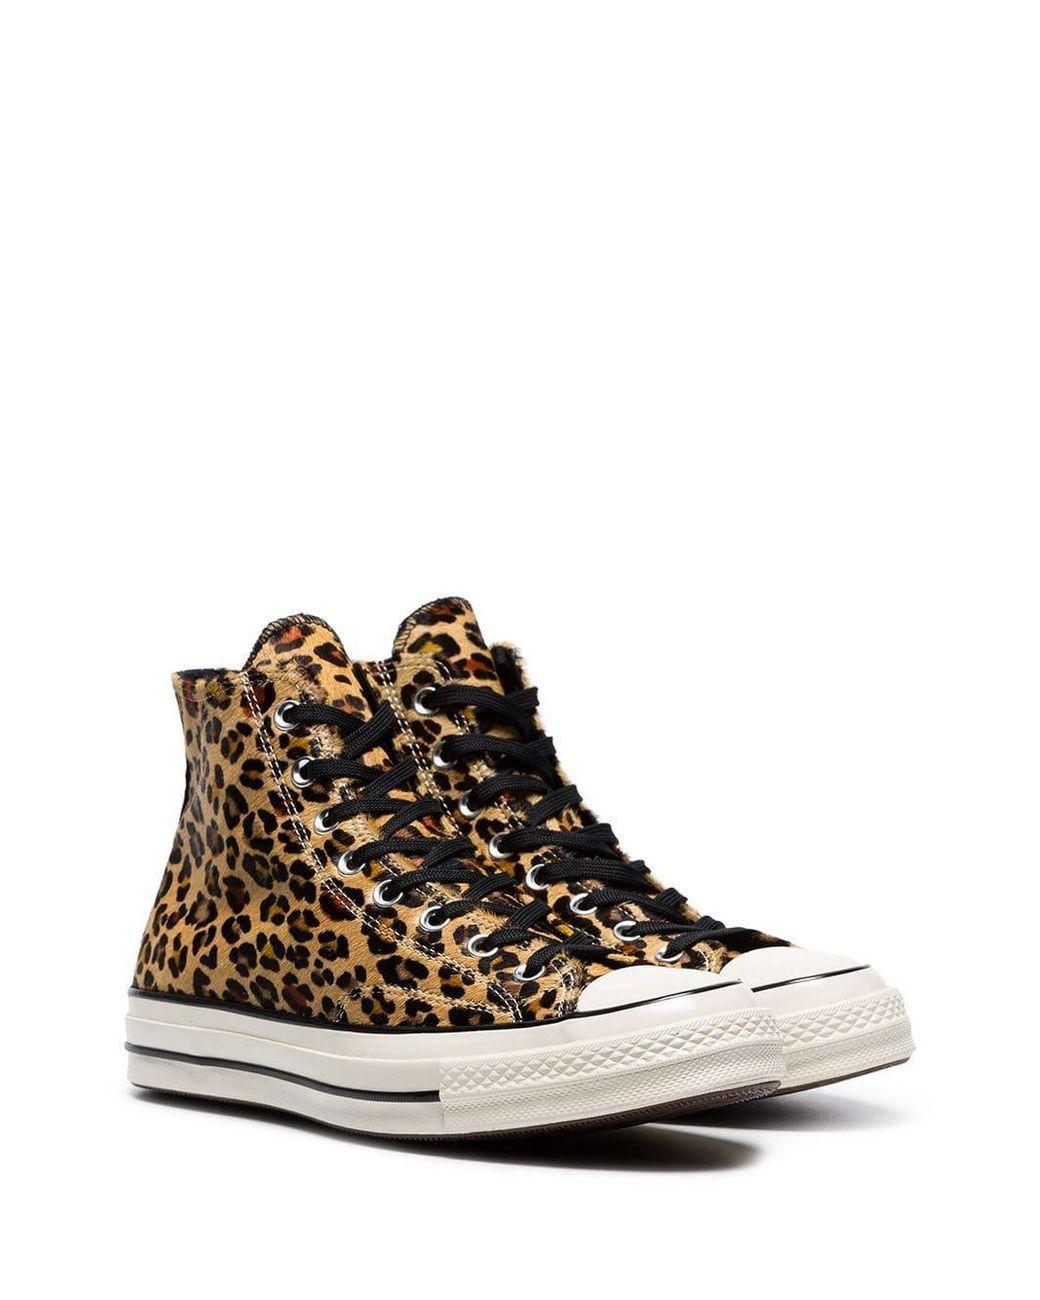 Converse Multicolor Leopard Print Chuck